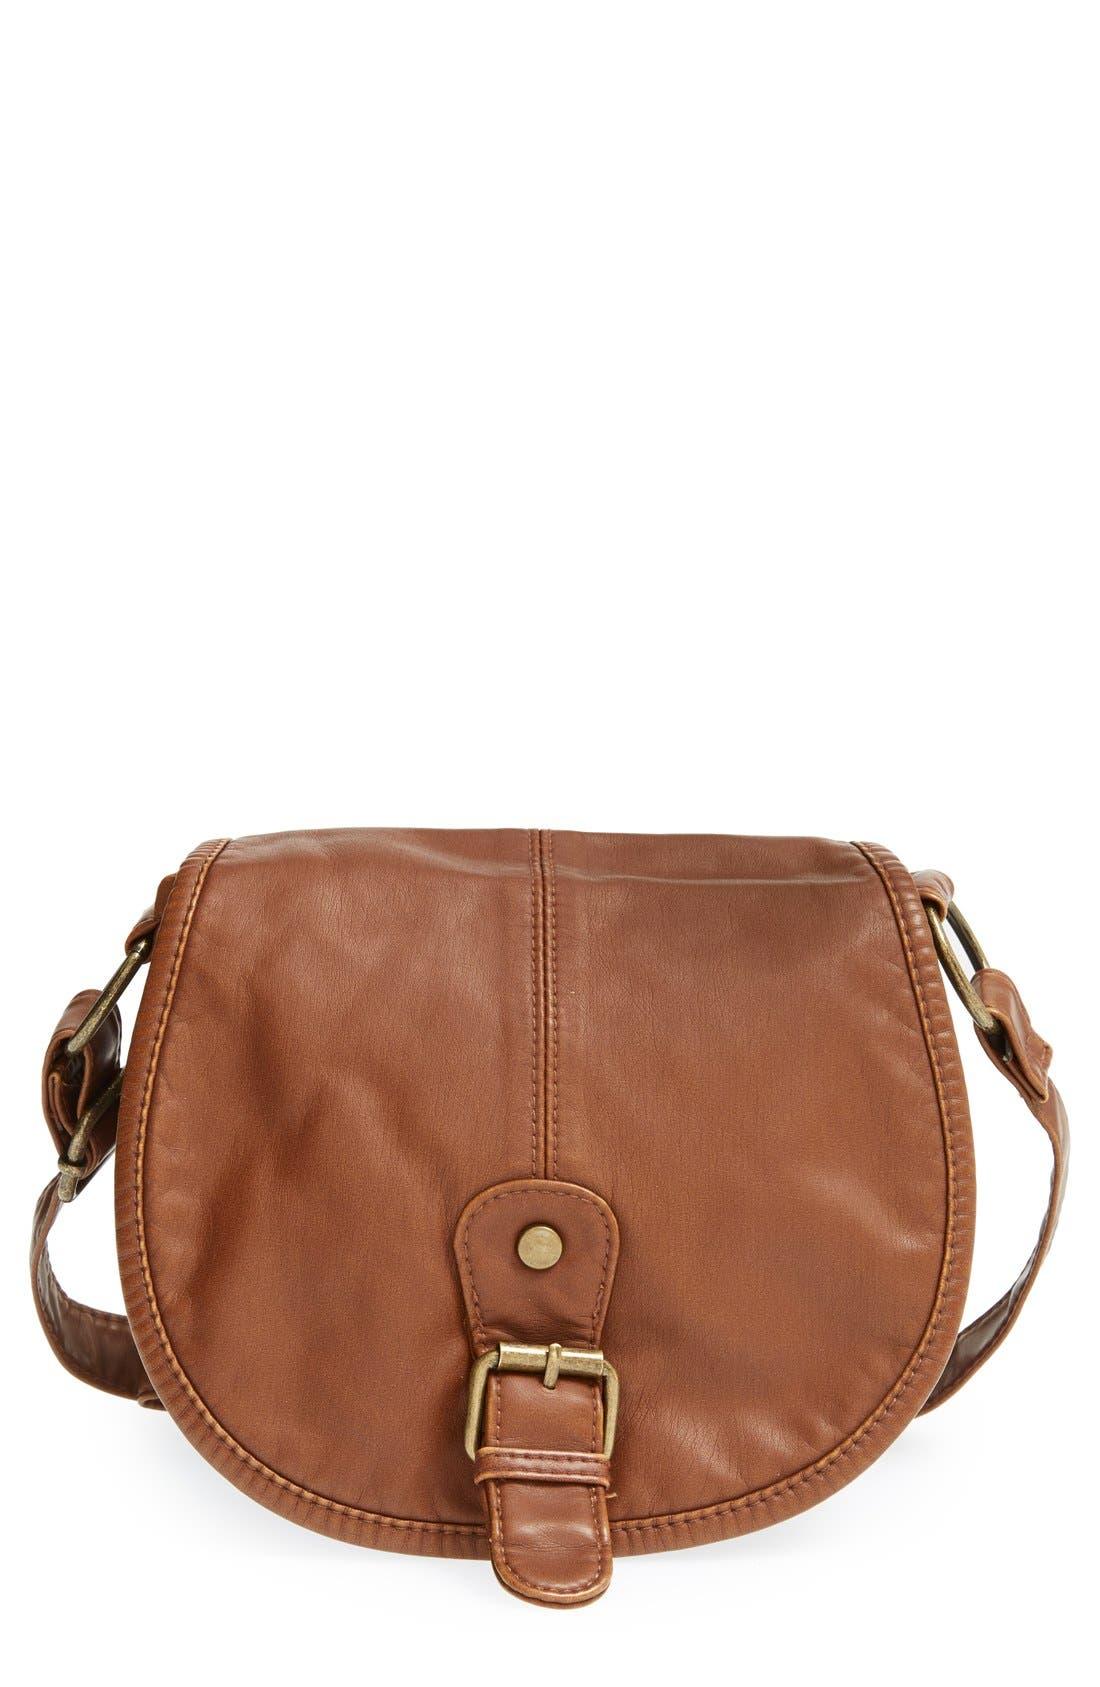 Alternate Image 1 Selected - BP. Woven Border Faux Leather Crossbody Bag